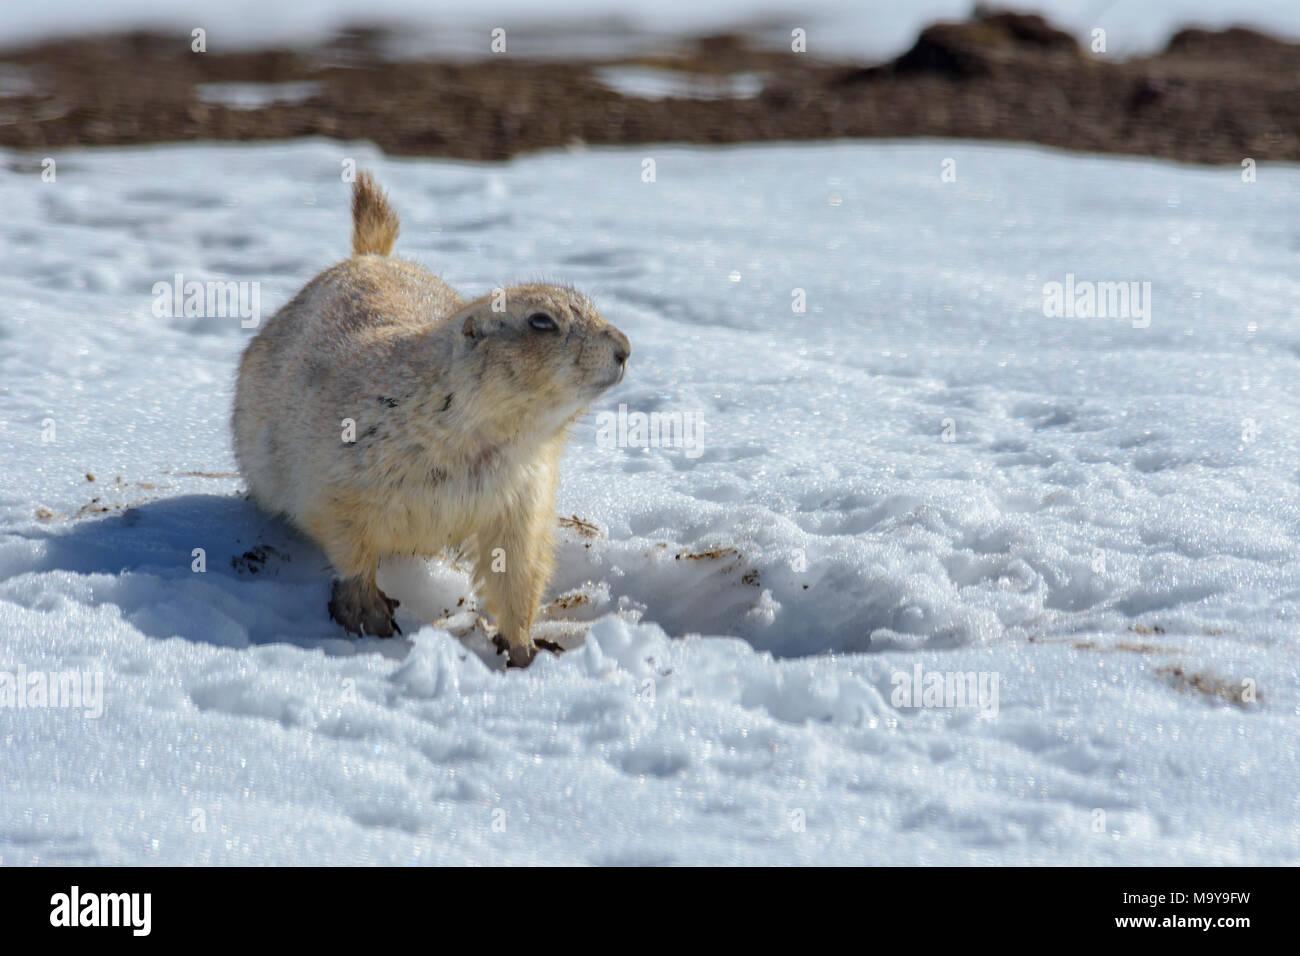 Gunnison's prairie dog (Cynomys gunnisoni) in winter, Castle Rock Colorado US. - Stock Image